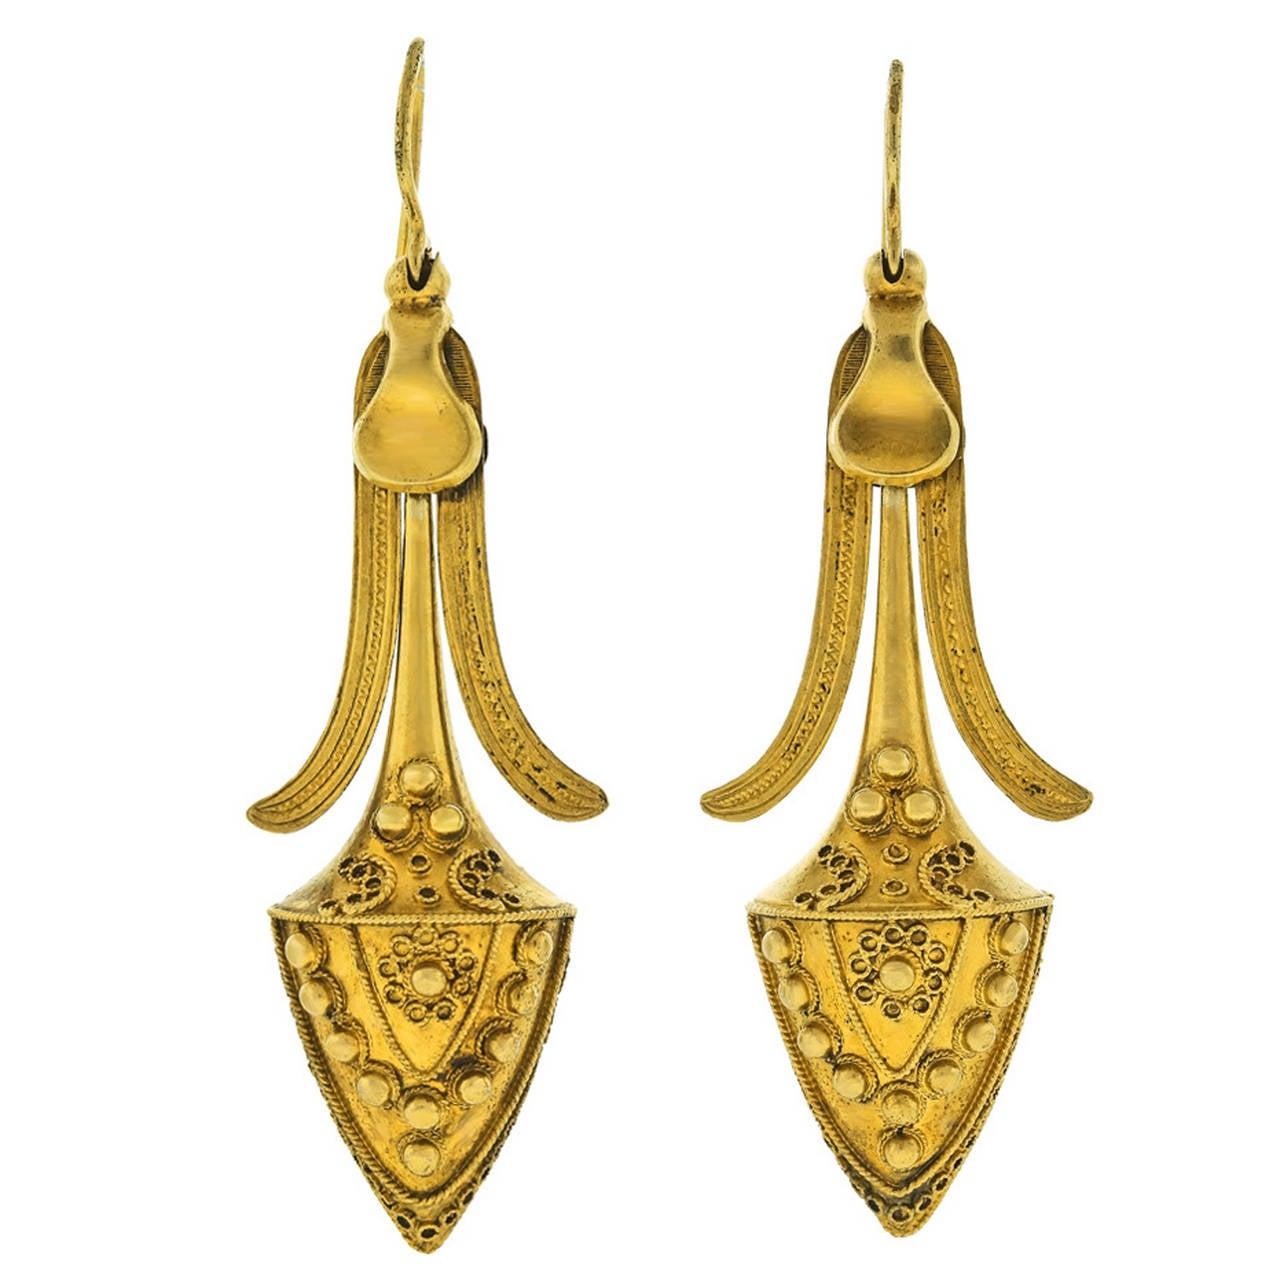 Antique Etruscan Revival Gold Earrings